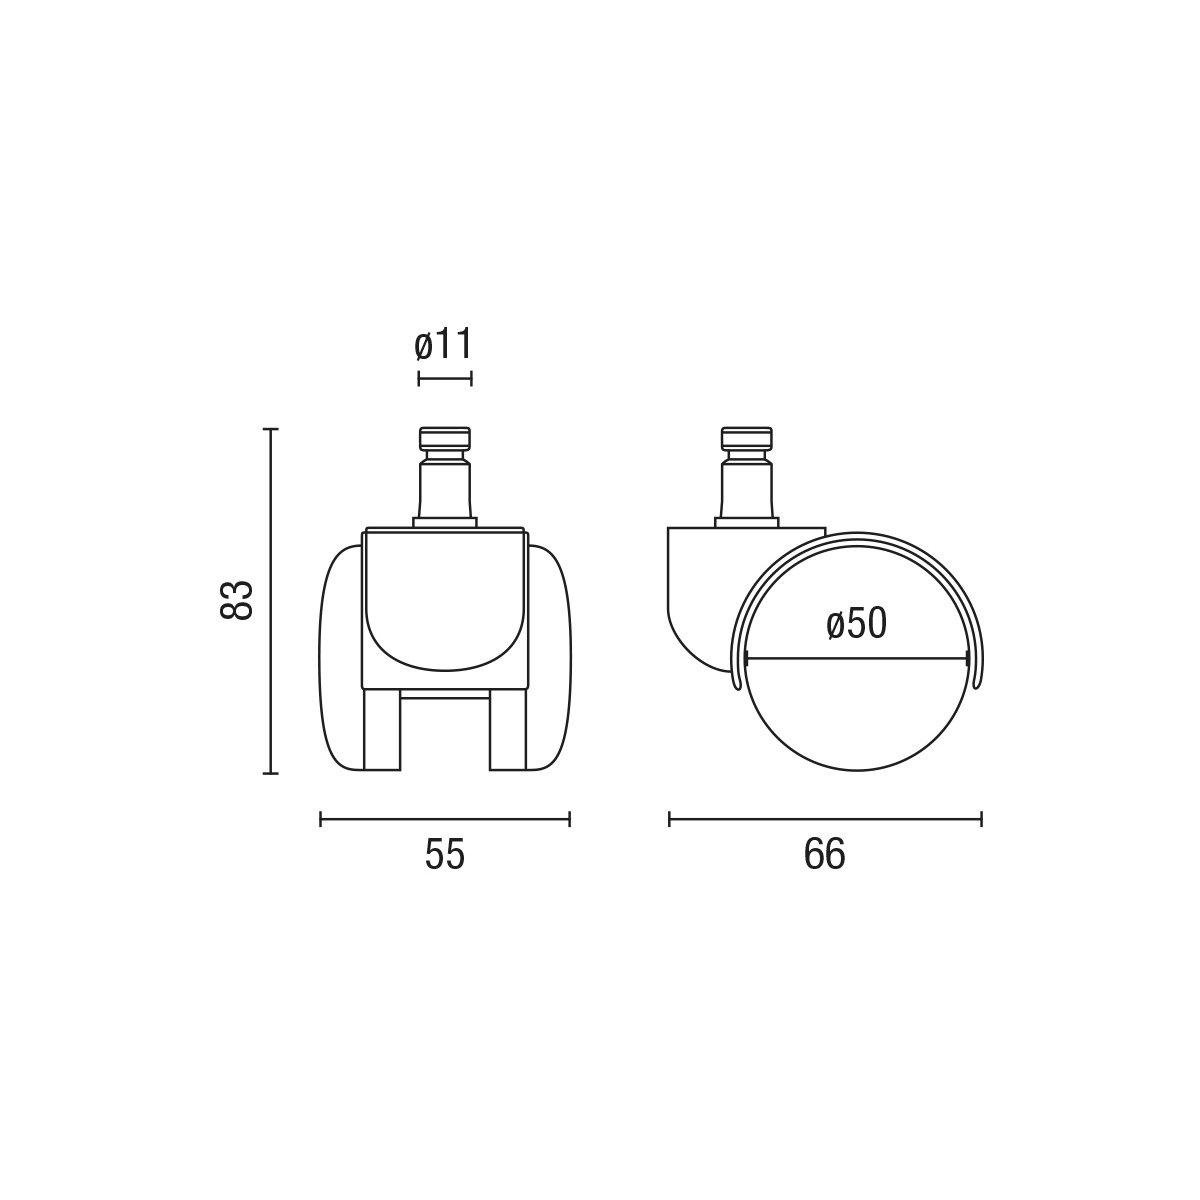 Pies fijos para sillas giratorias Tacos-topes fijos para Silla Escritorio giratoria Enganche de 11 mm para sillones